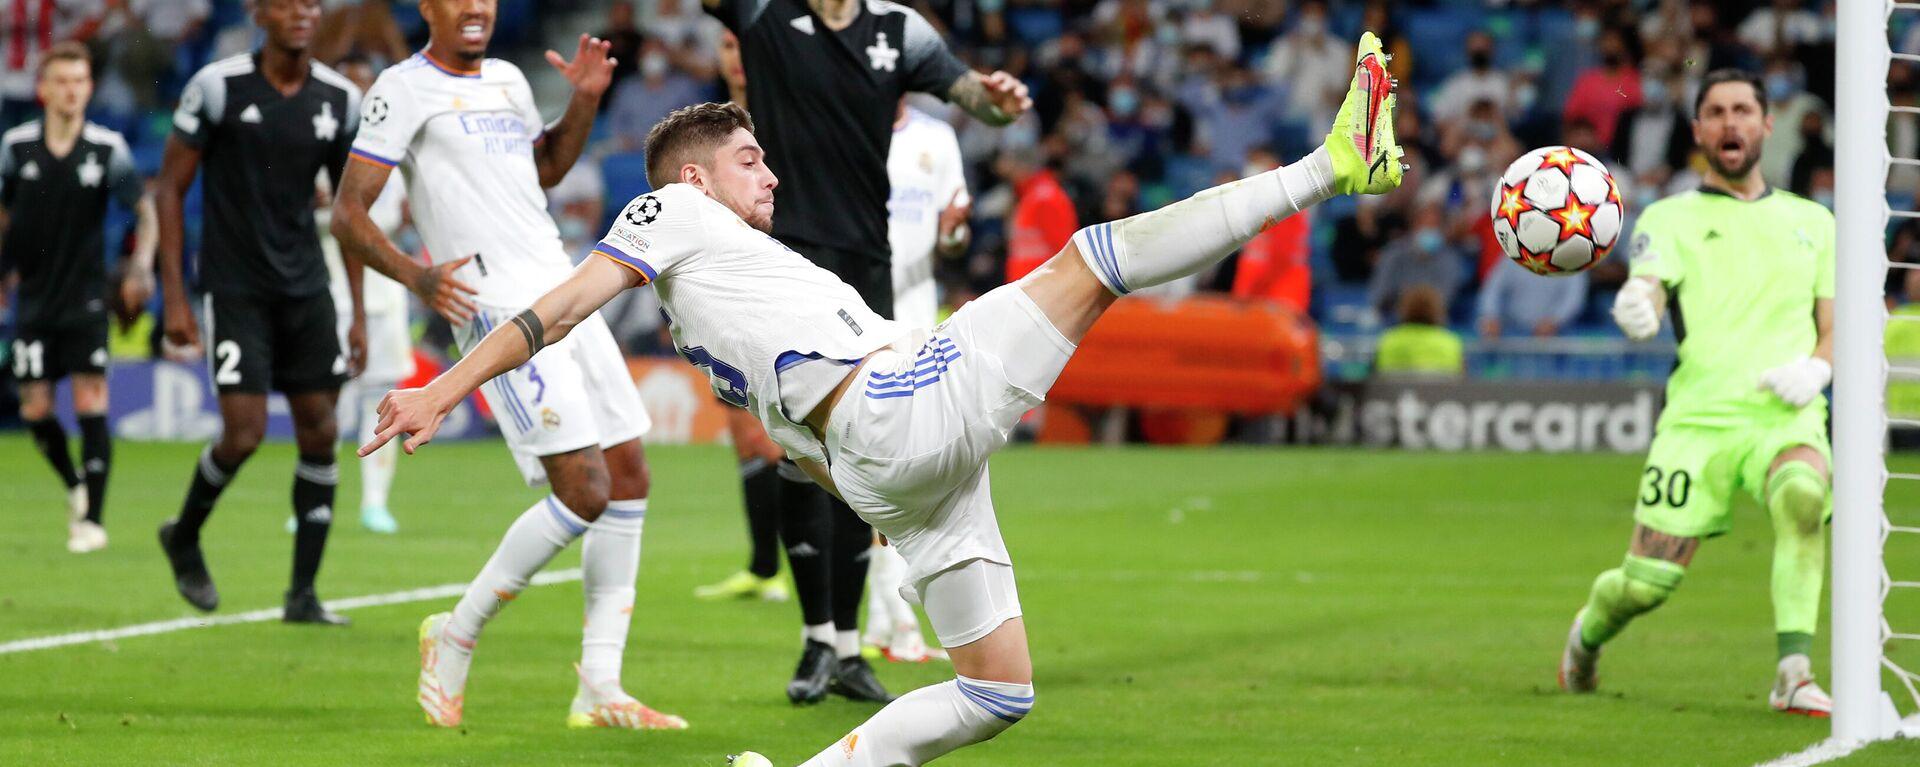 La Liga de Campeones, Real Madrid vs Sheriff Tiraspol - Sputnik Mundo, 1920, 30.09.2021